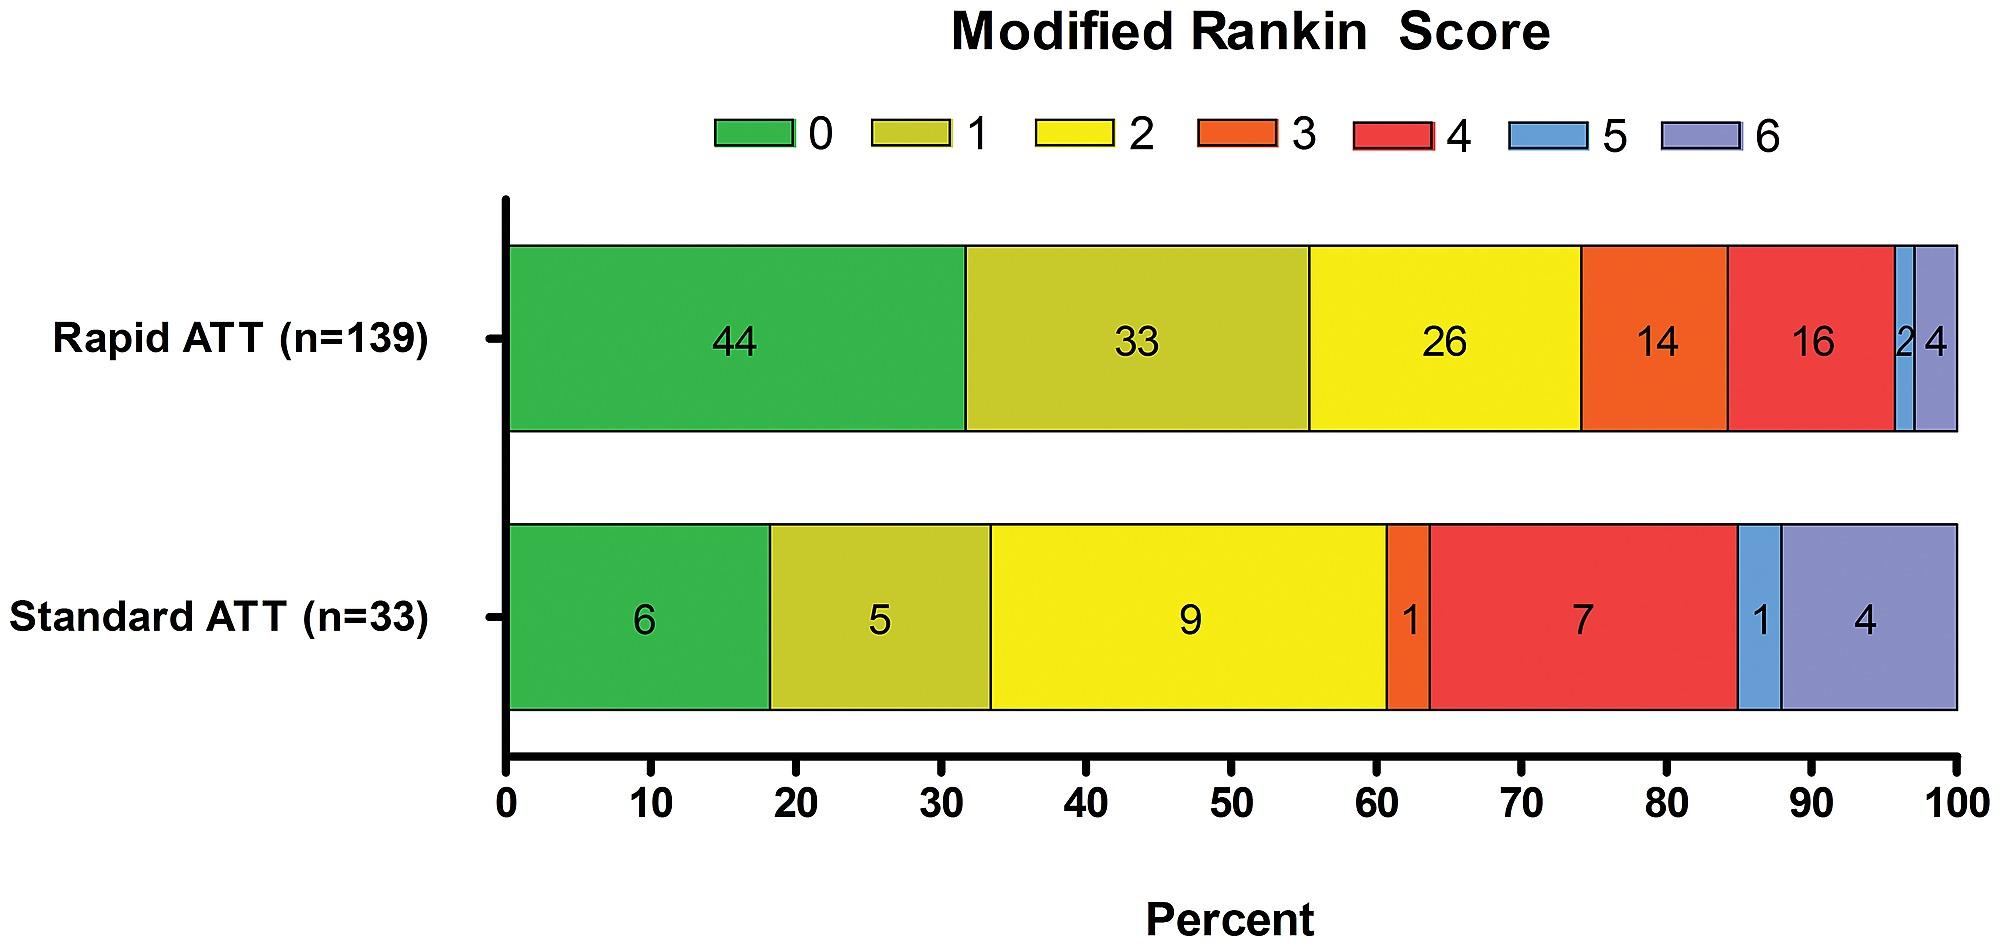 modified rankin scale score distribution at day 90 of stroke